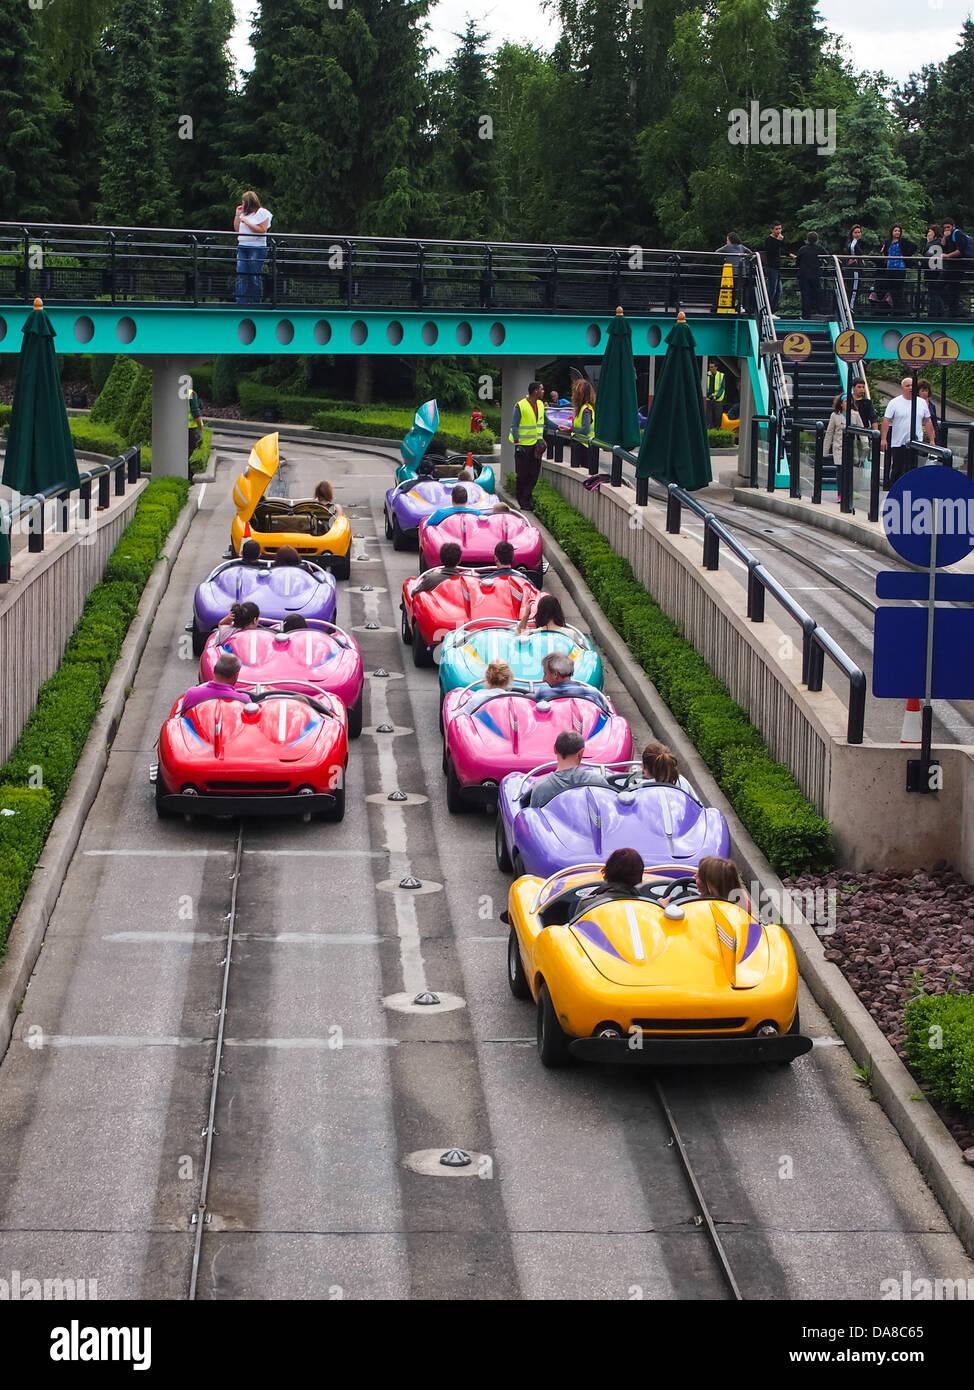 Race Car Ride At Disneyland